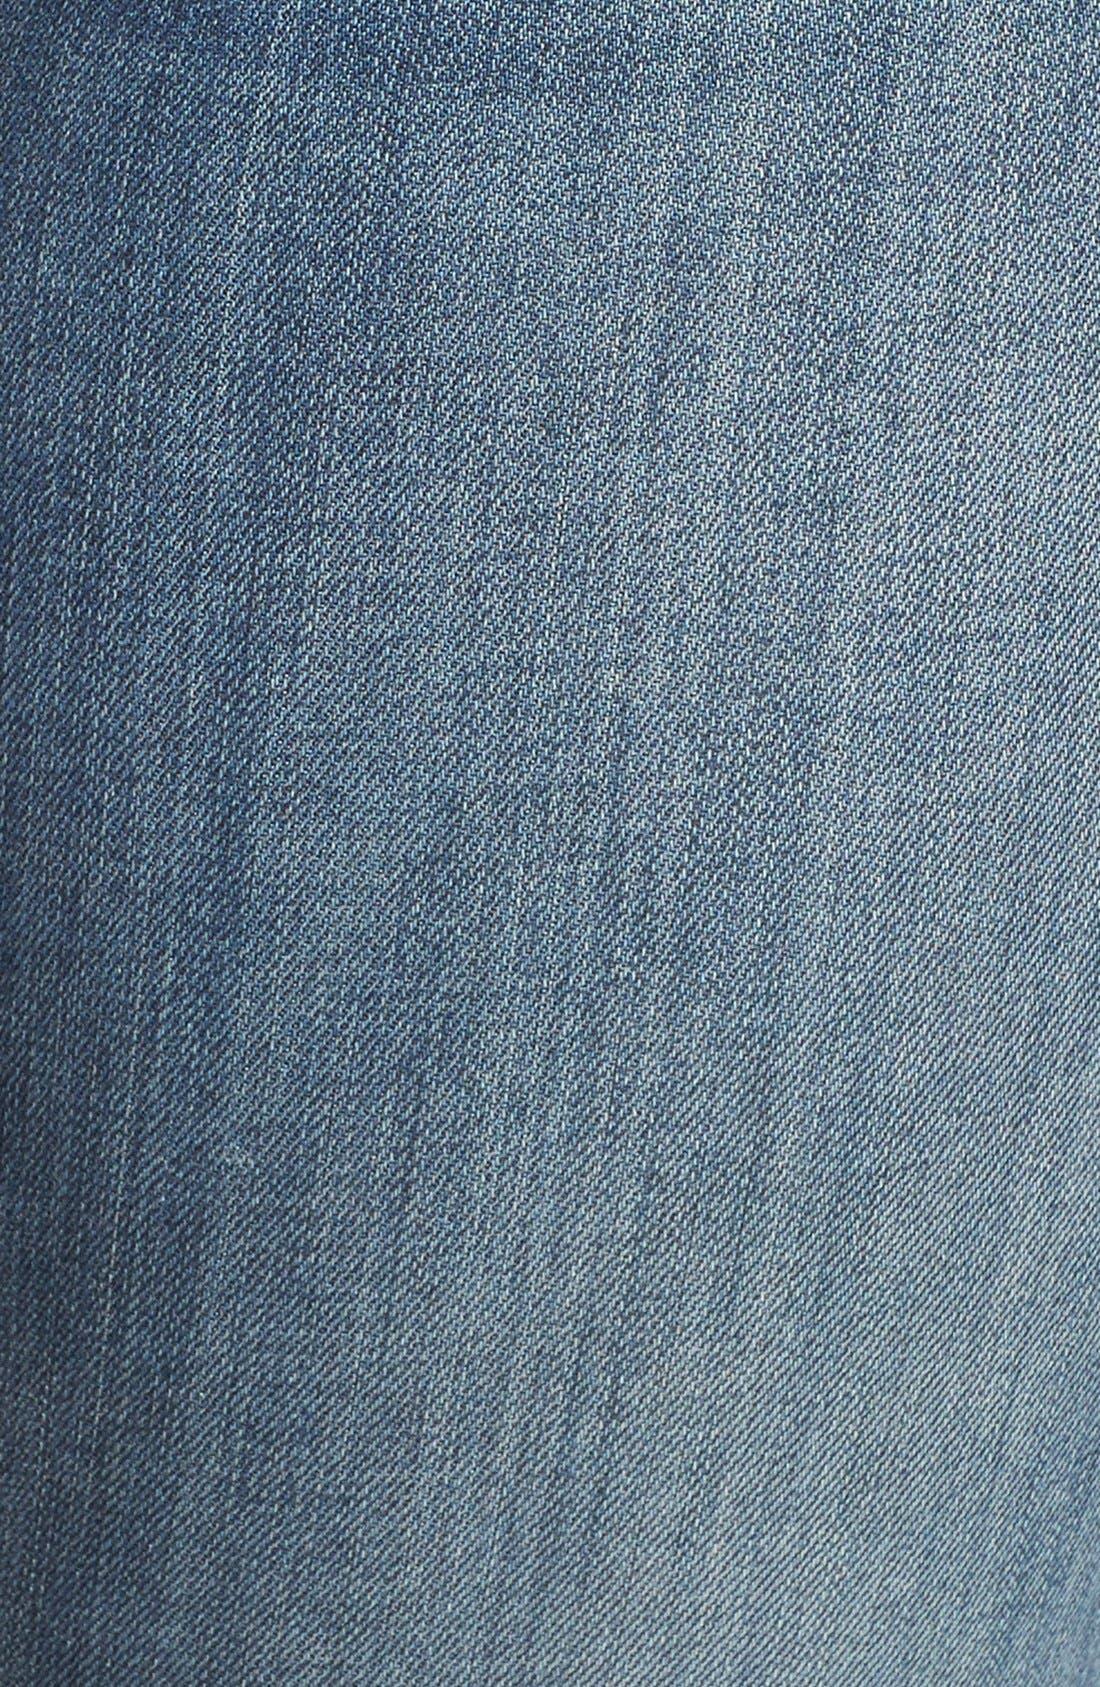 'Reese' Crop Flare Leg Jeans,                             Alternate thumbnail 5, color,                             453